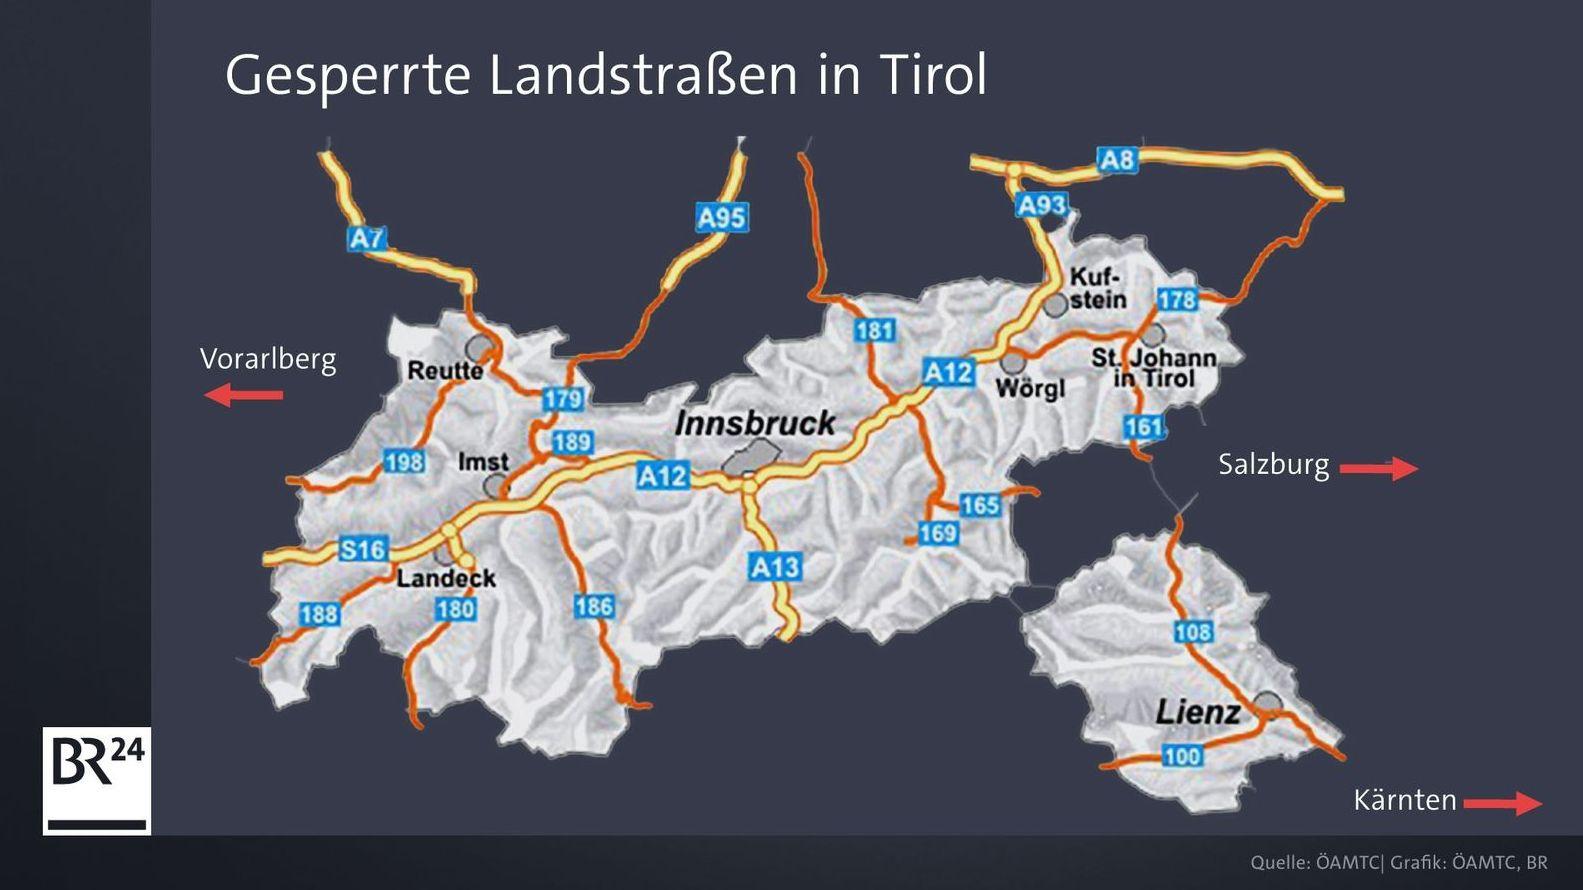 Gesperrte Landstraßen in Tirol  (Stand: Ende Juni 2019)